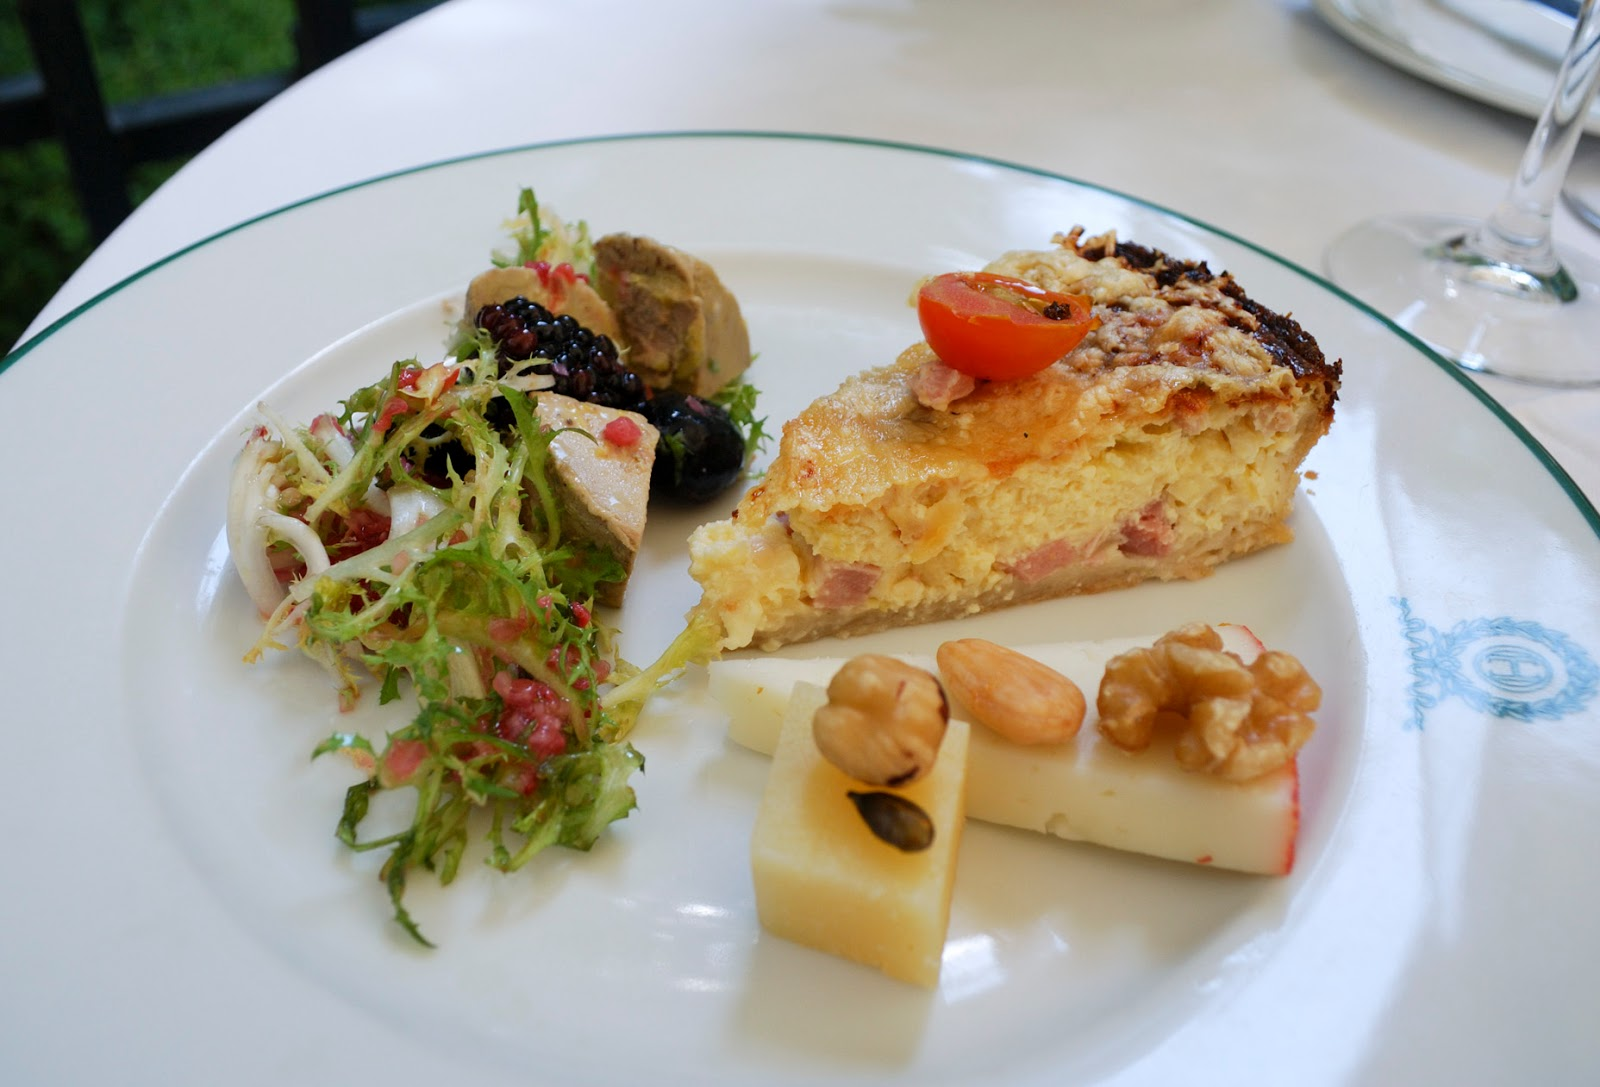 Hotel Orfila brunch Madrid Spain five star buffet